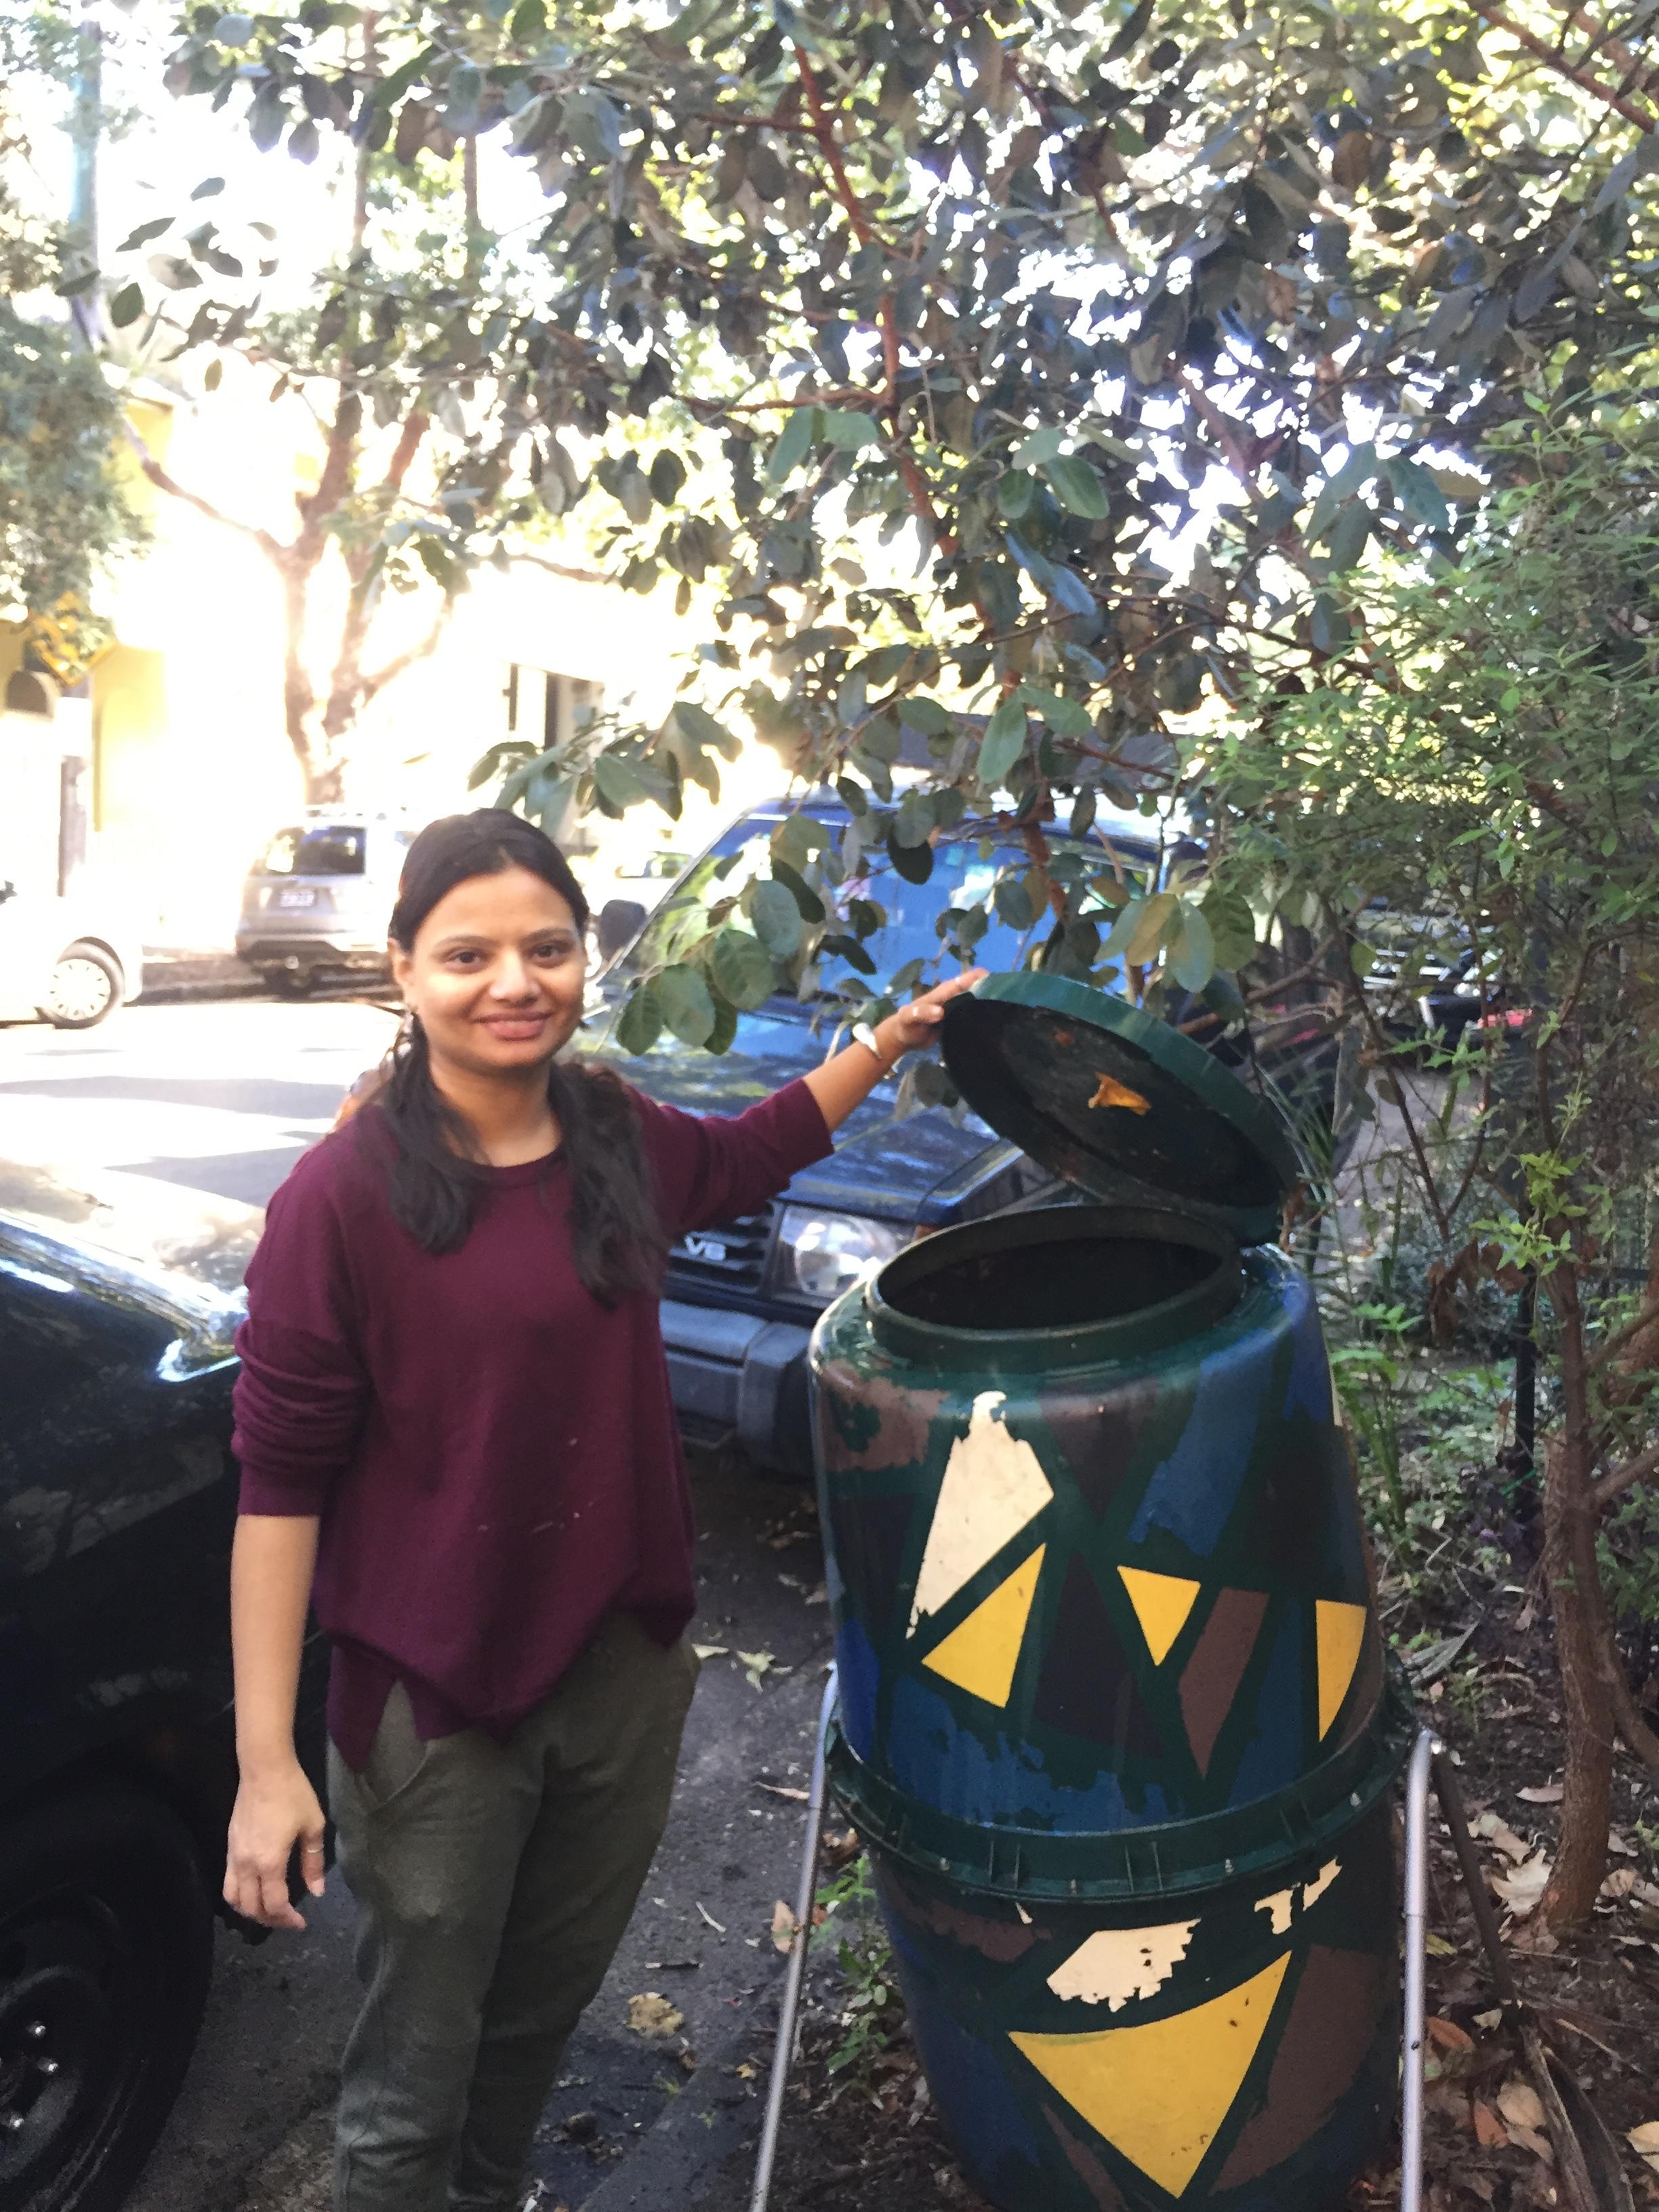 Tanaya taking care of a compost bin